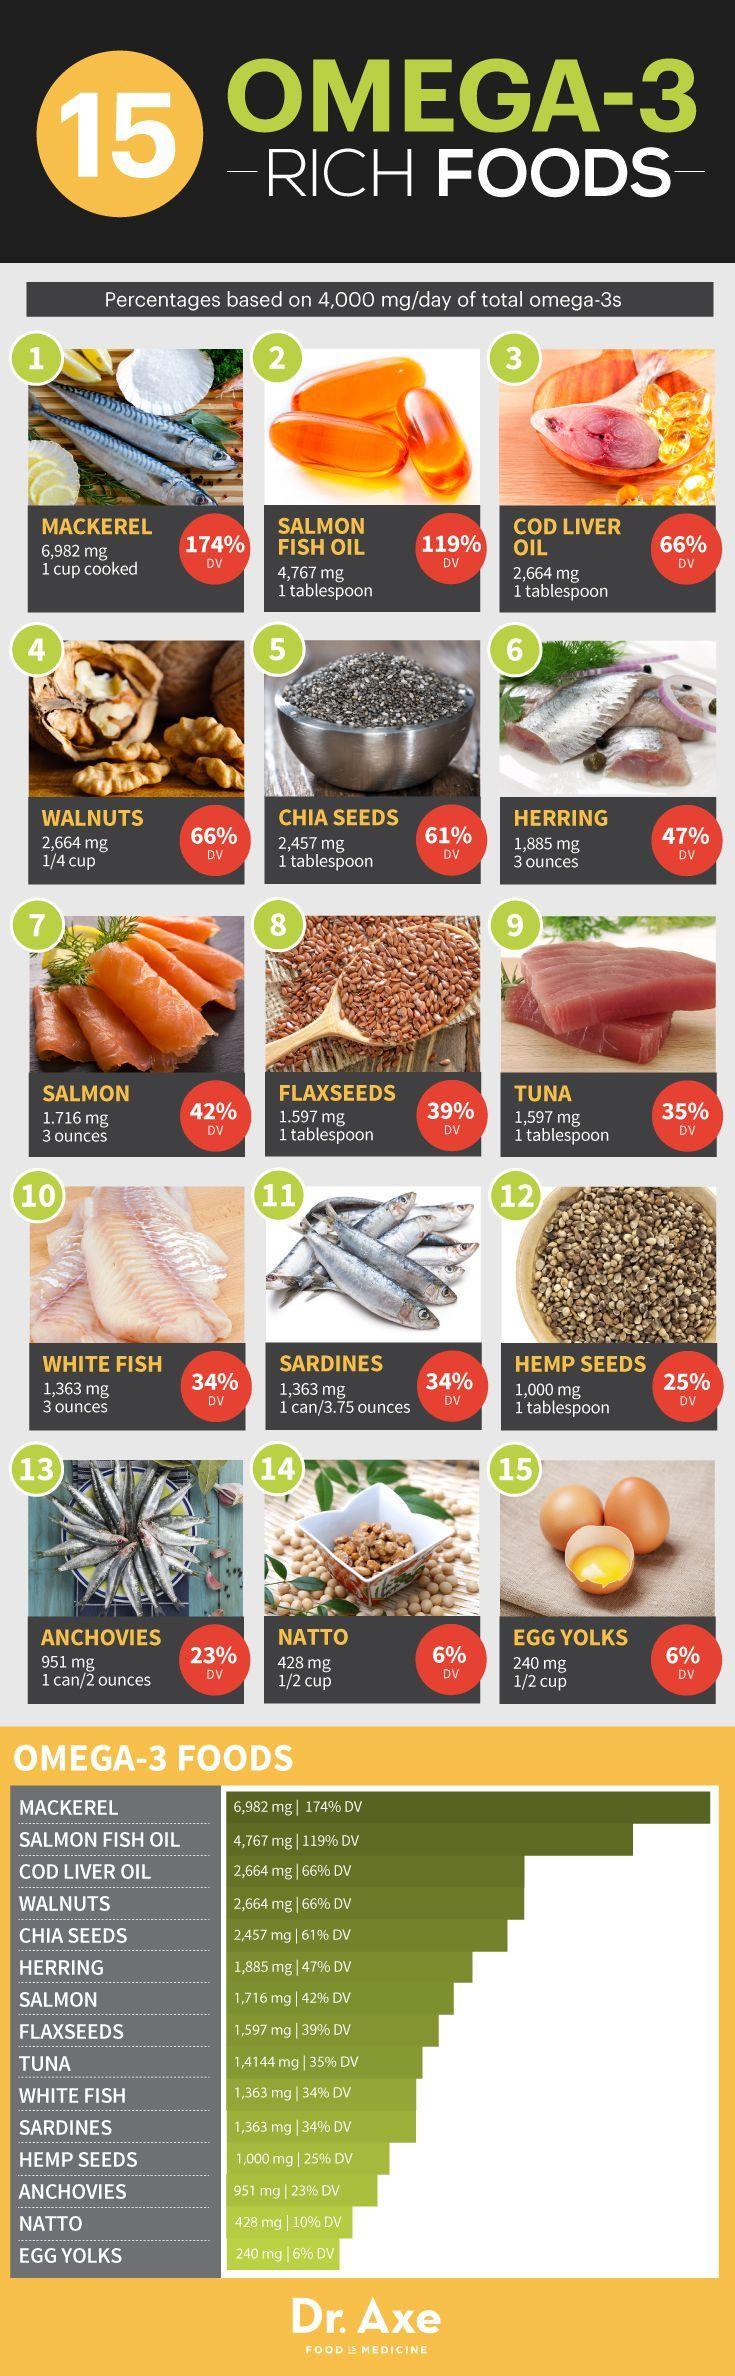 Omega-3 foods  www.draxe.com #health #holistic #natural